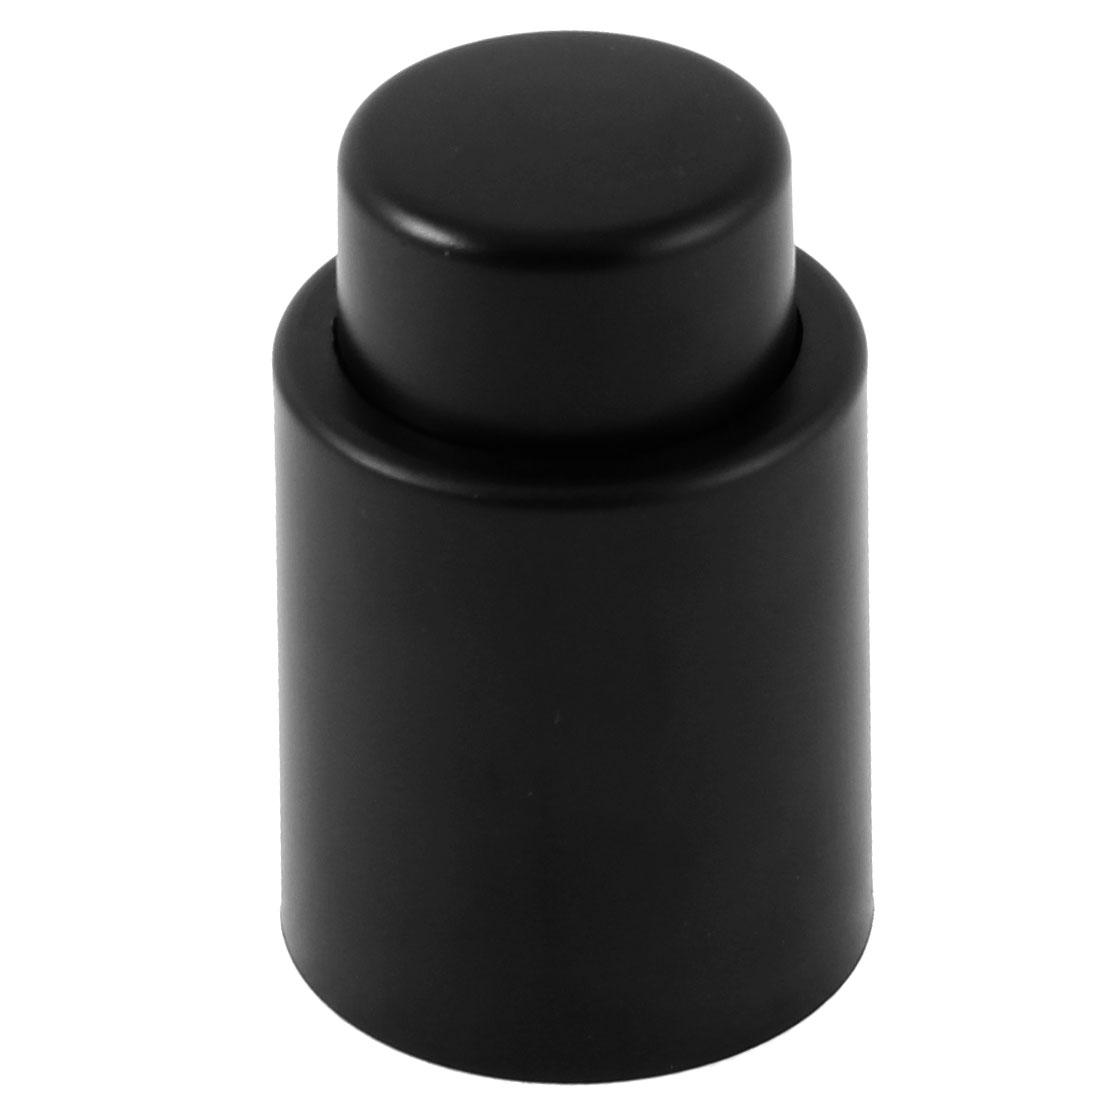 Vacuum Sealed Wine Champagne Liquor Storage Bottle Press Stopper Cap Black